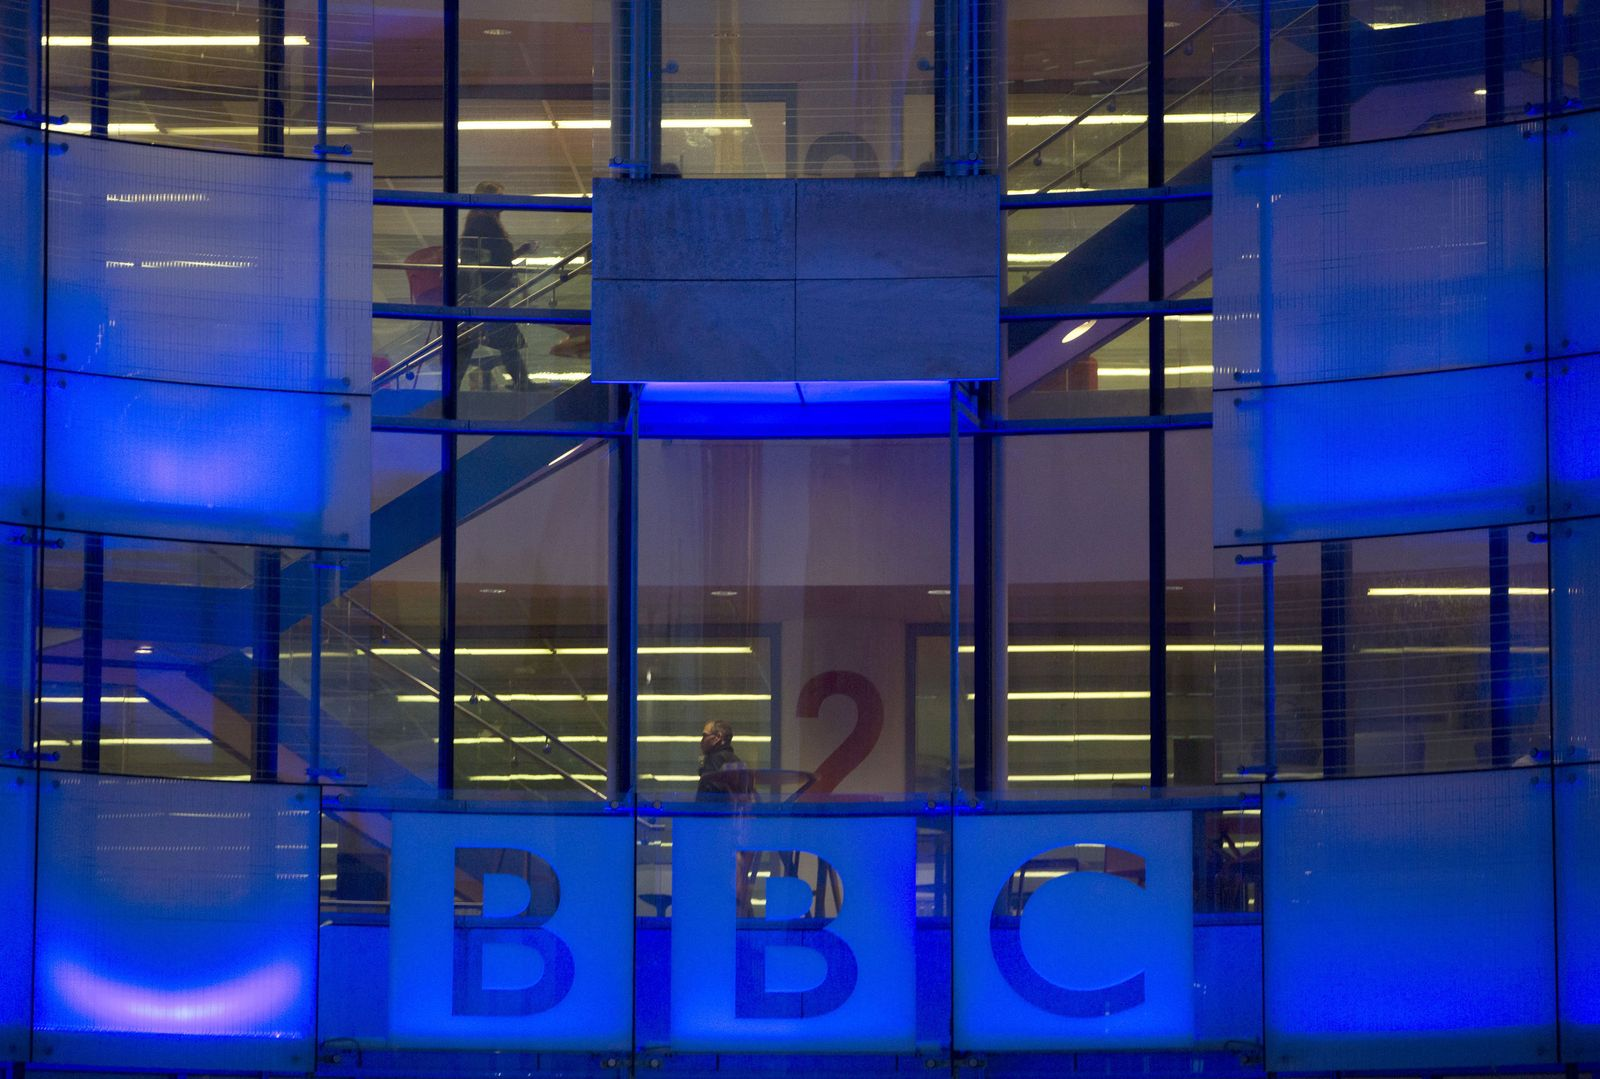 BBC / London